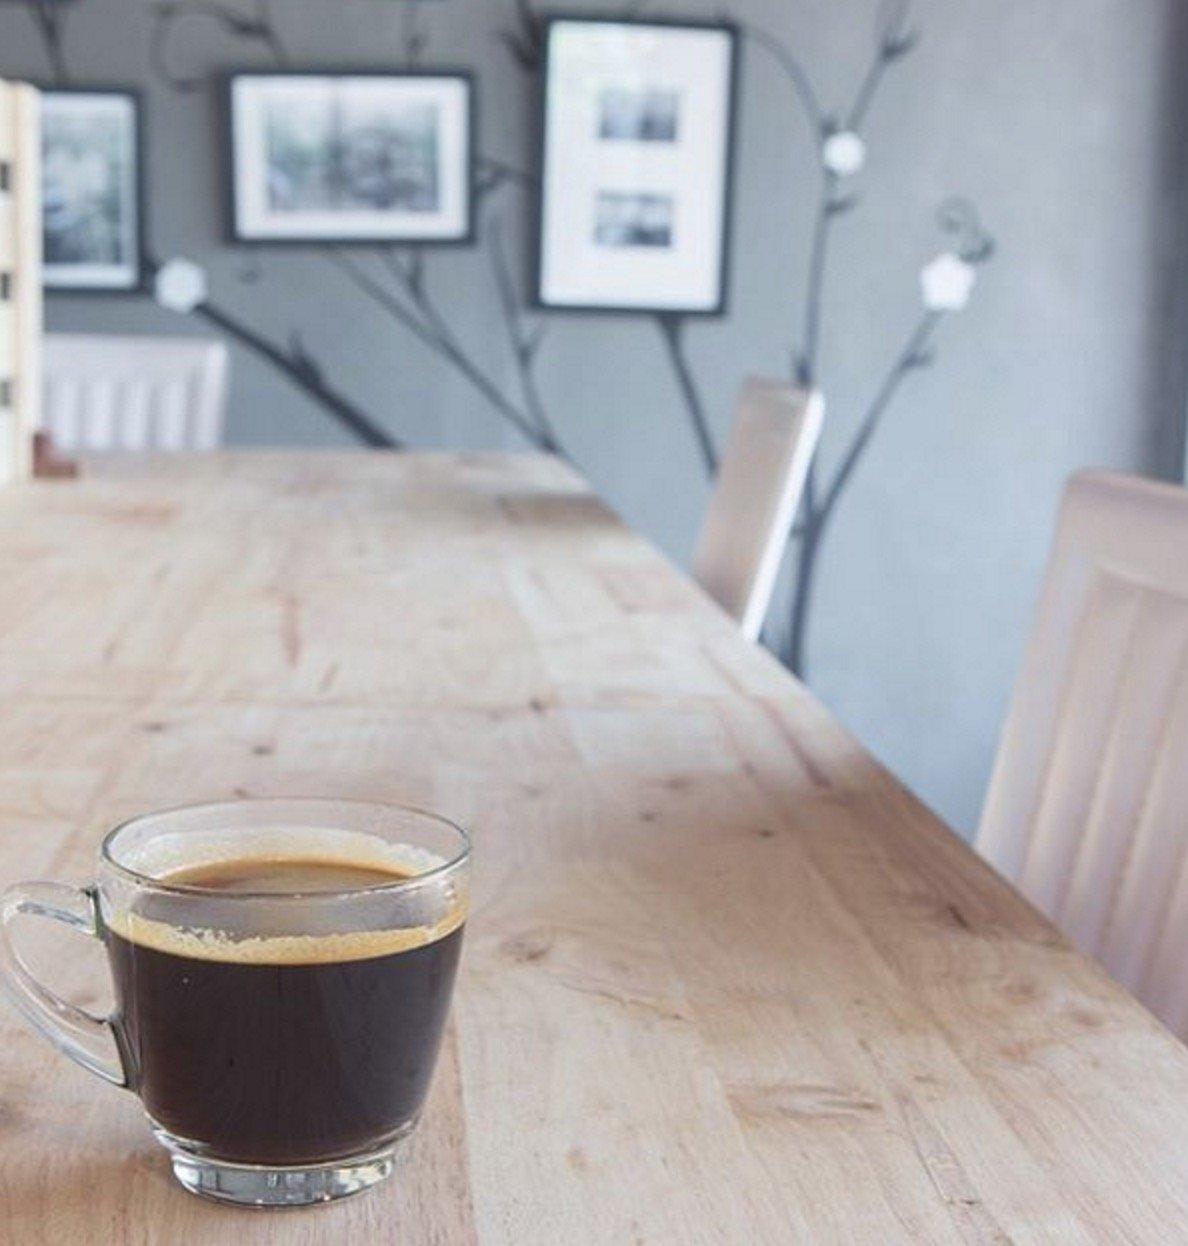 Consejos para beber menos café